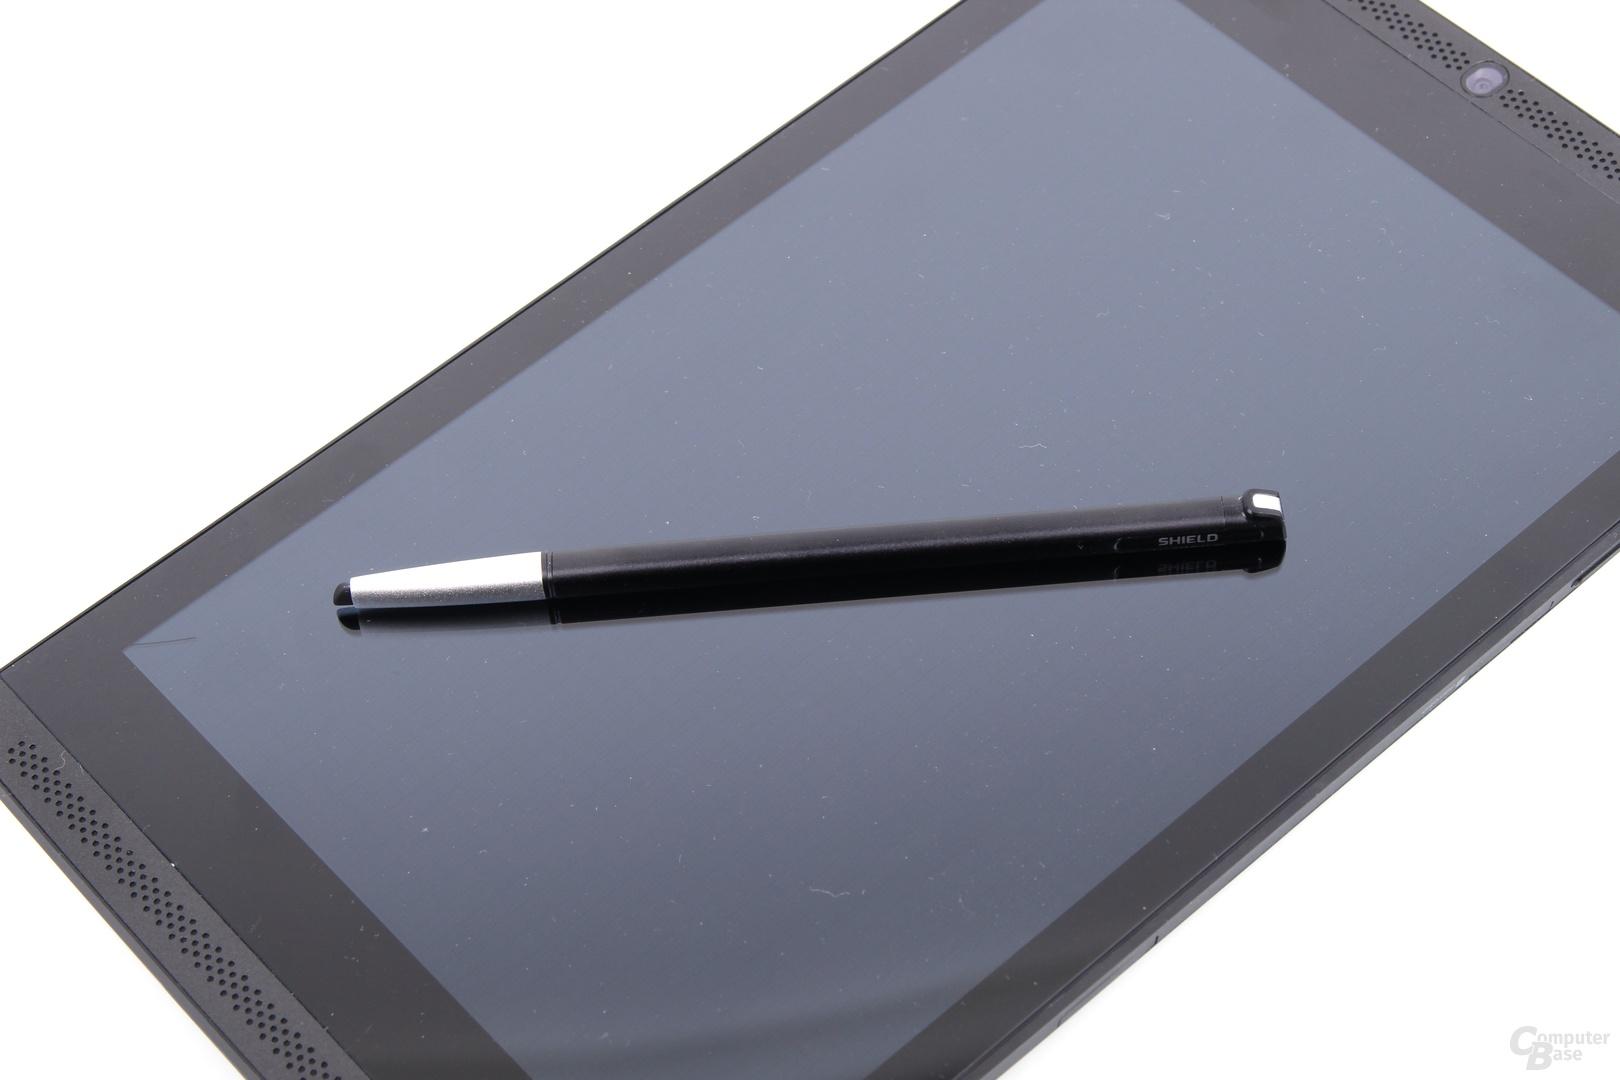 Nvidia Shield Tablet - Stylus